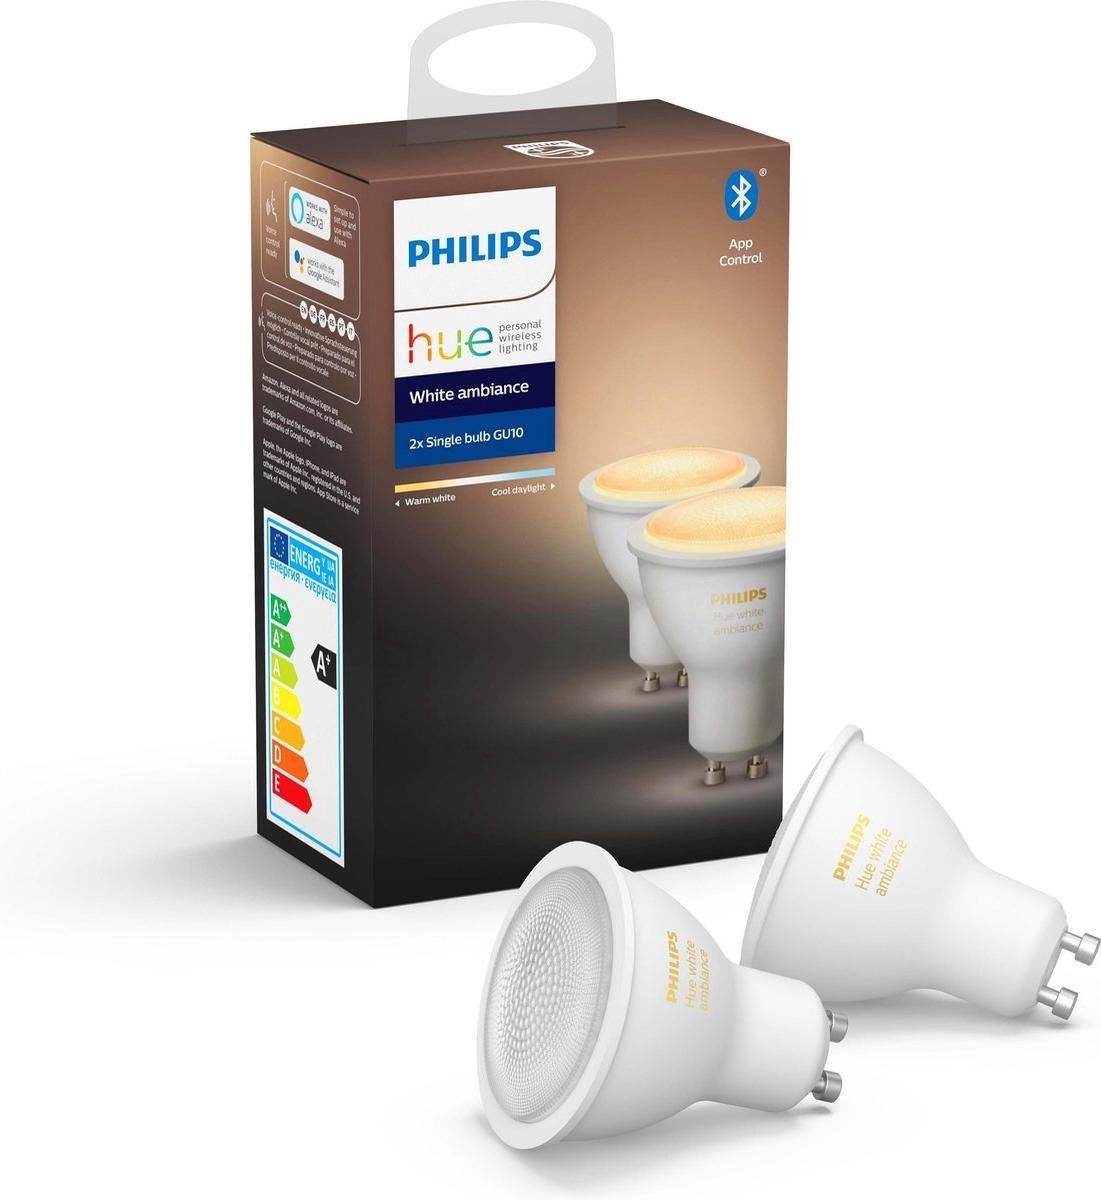 Philips Hue Slimme verlichting Spot Lamp - White Ambiance - GU10 - Bluetooth - 2 Stuks